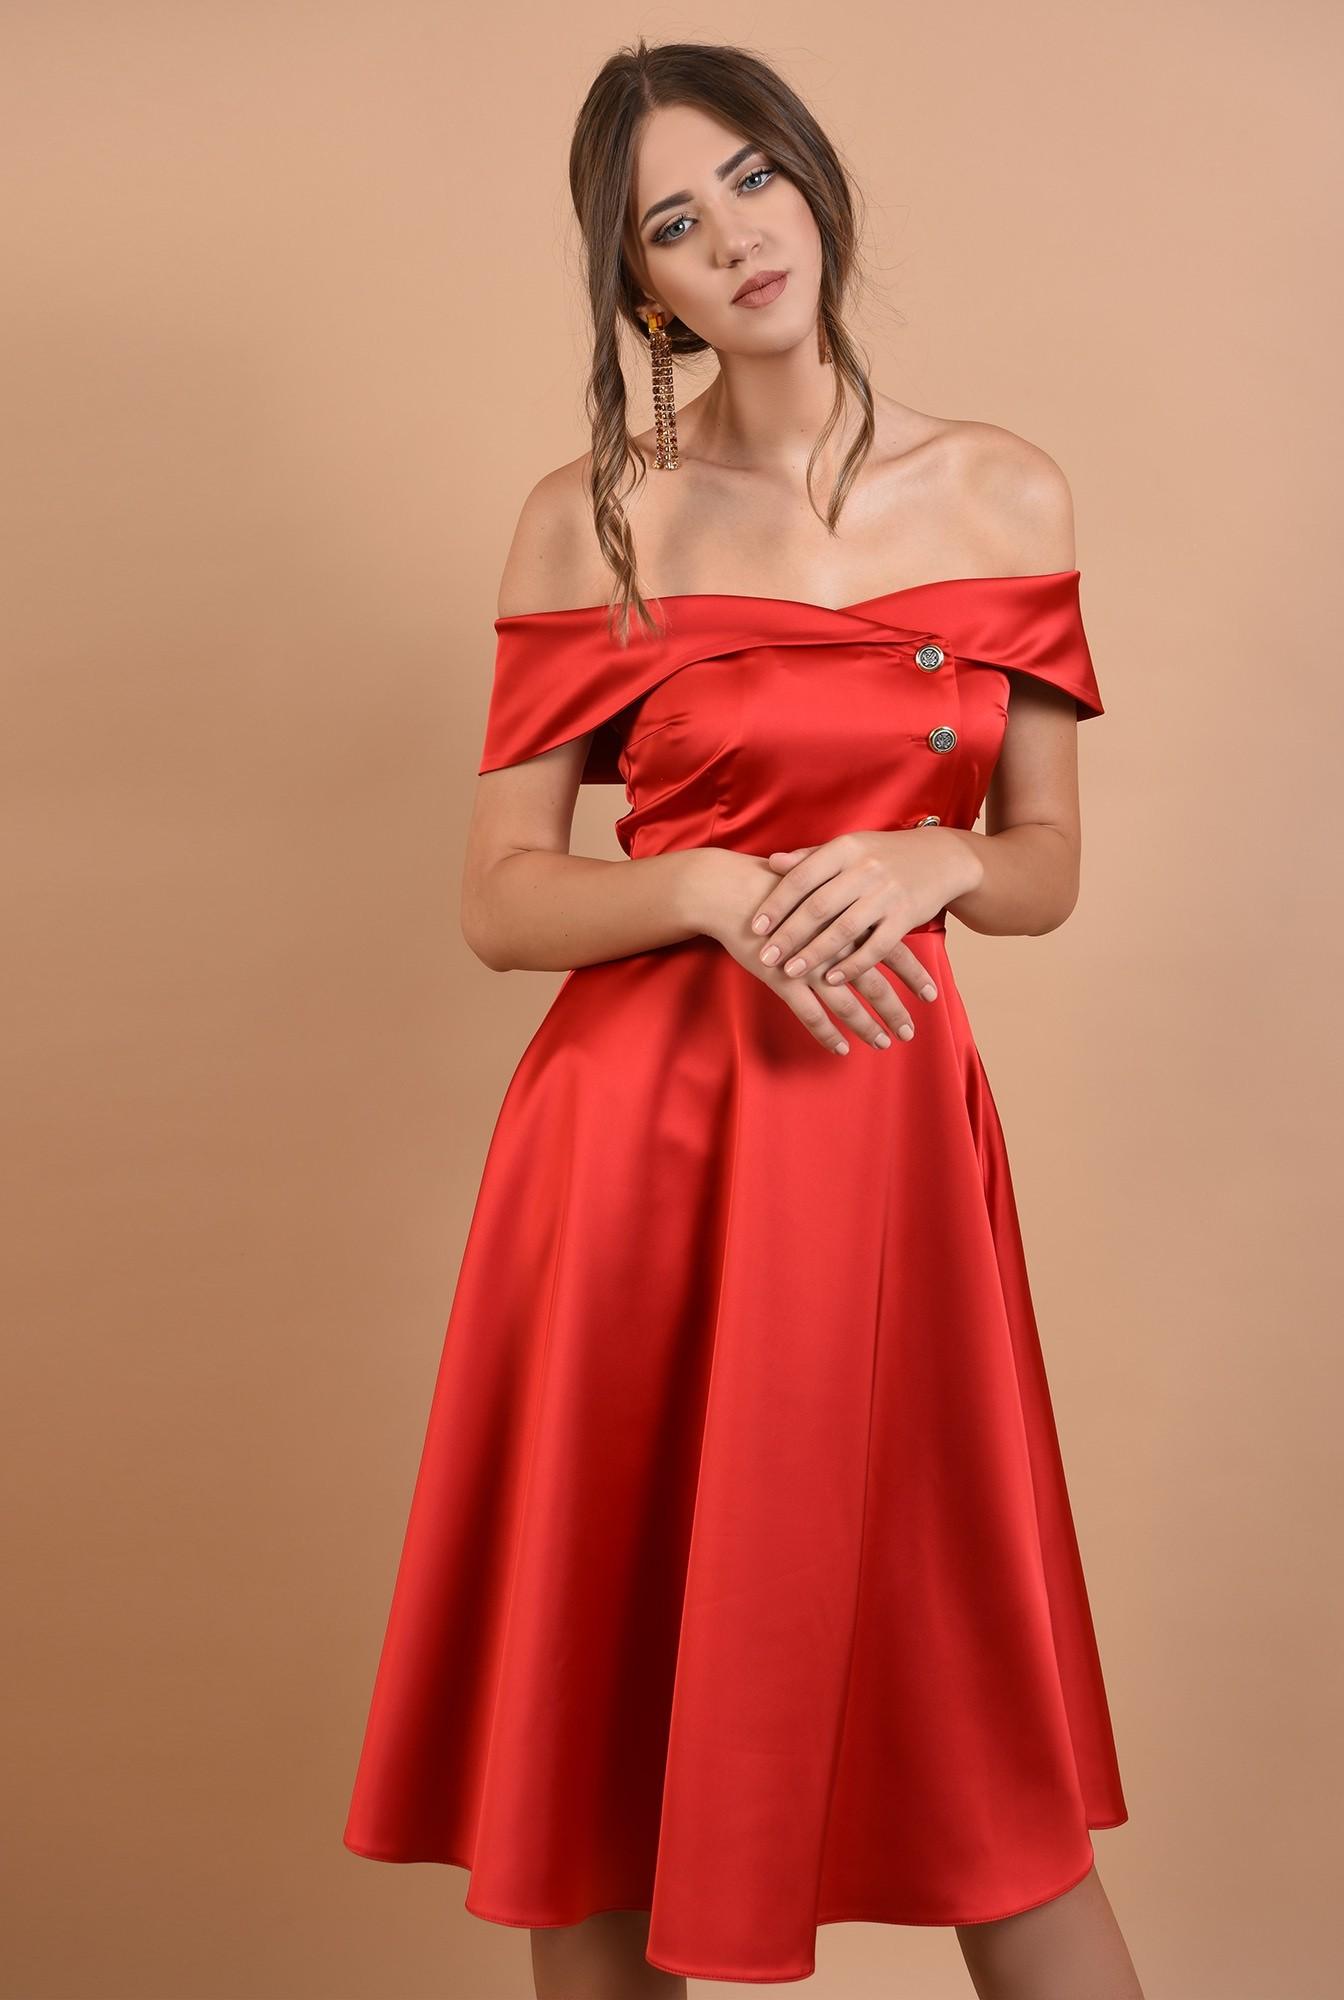 0 - 360 - rochie de ocazie, rosie, evazata, cu umeri goi